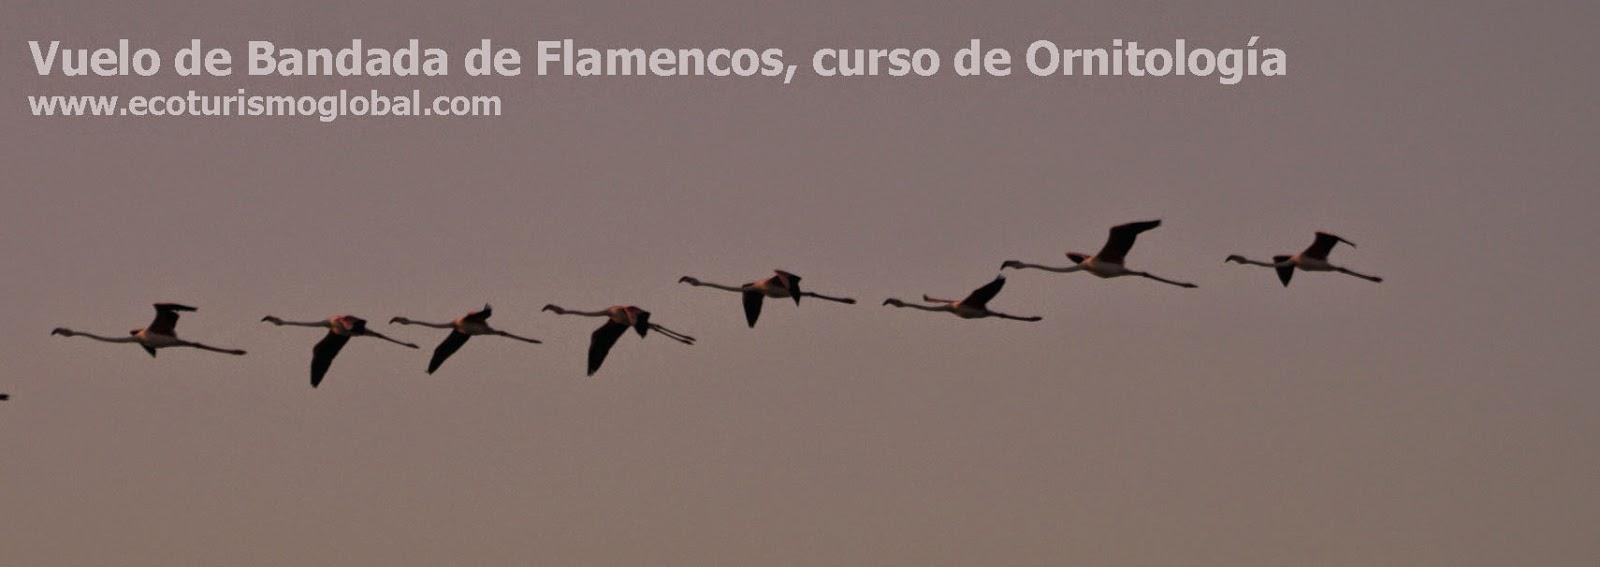 www.ecoturismoglobal.com